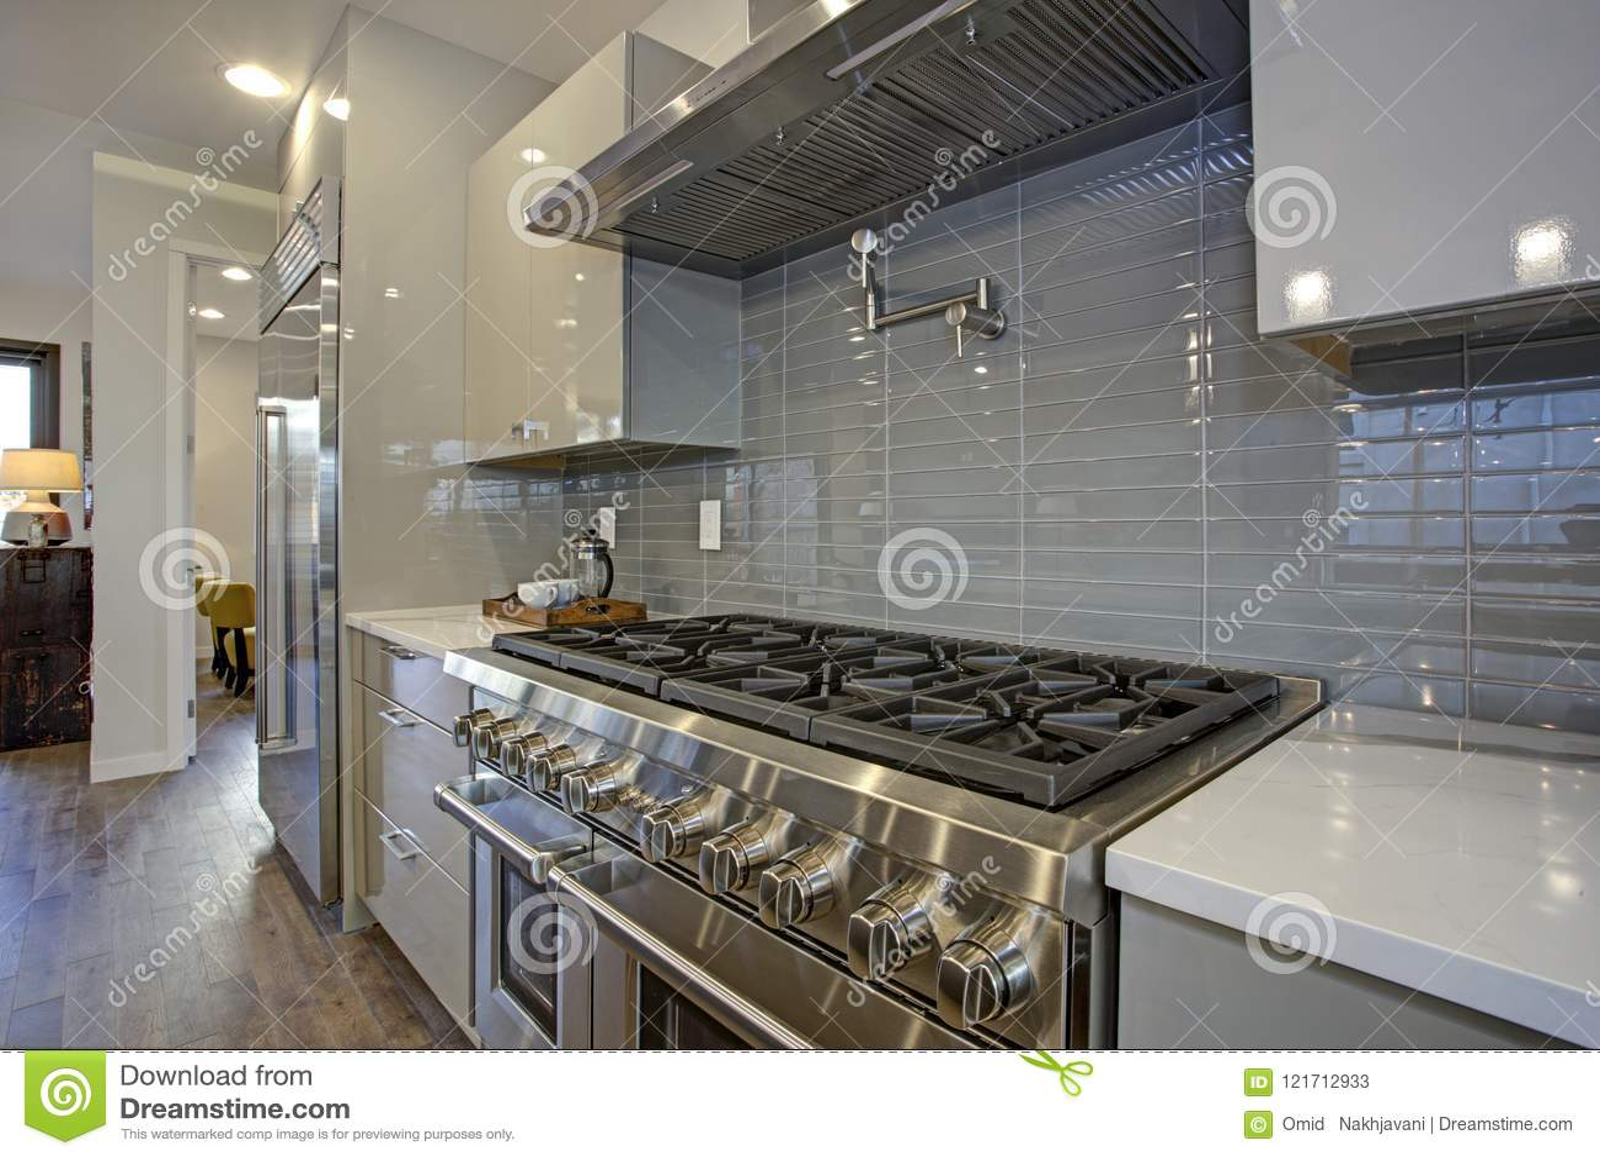 - Sleek Modern Kitchen Design With A Glossy Gray Backsplash. Stock